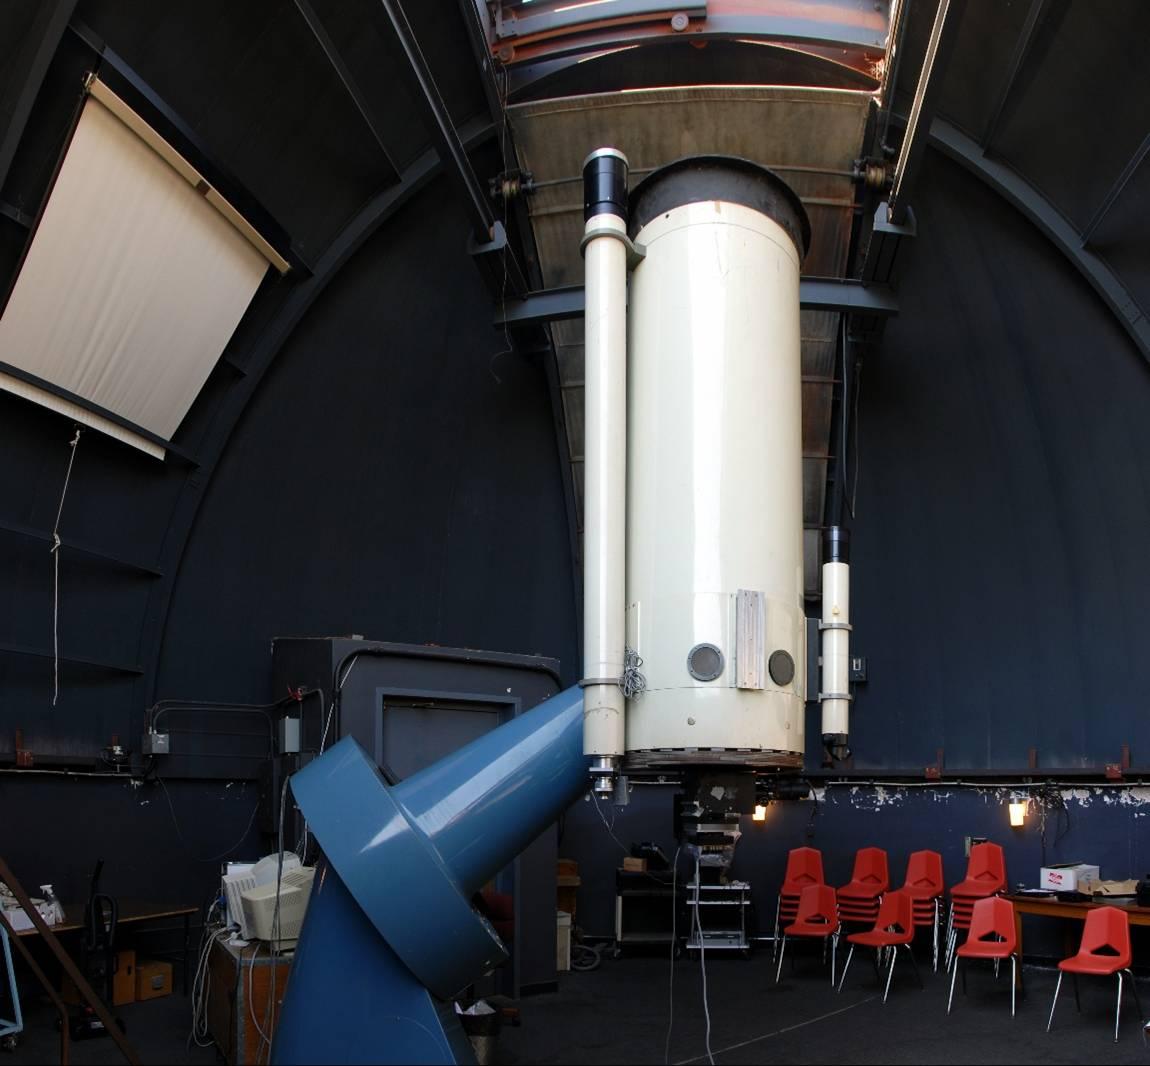 Morehead Observatory's 24-inch diameter telescope.